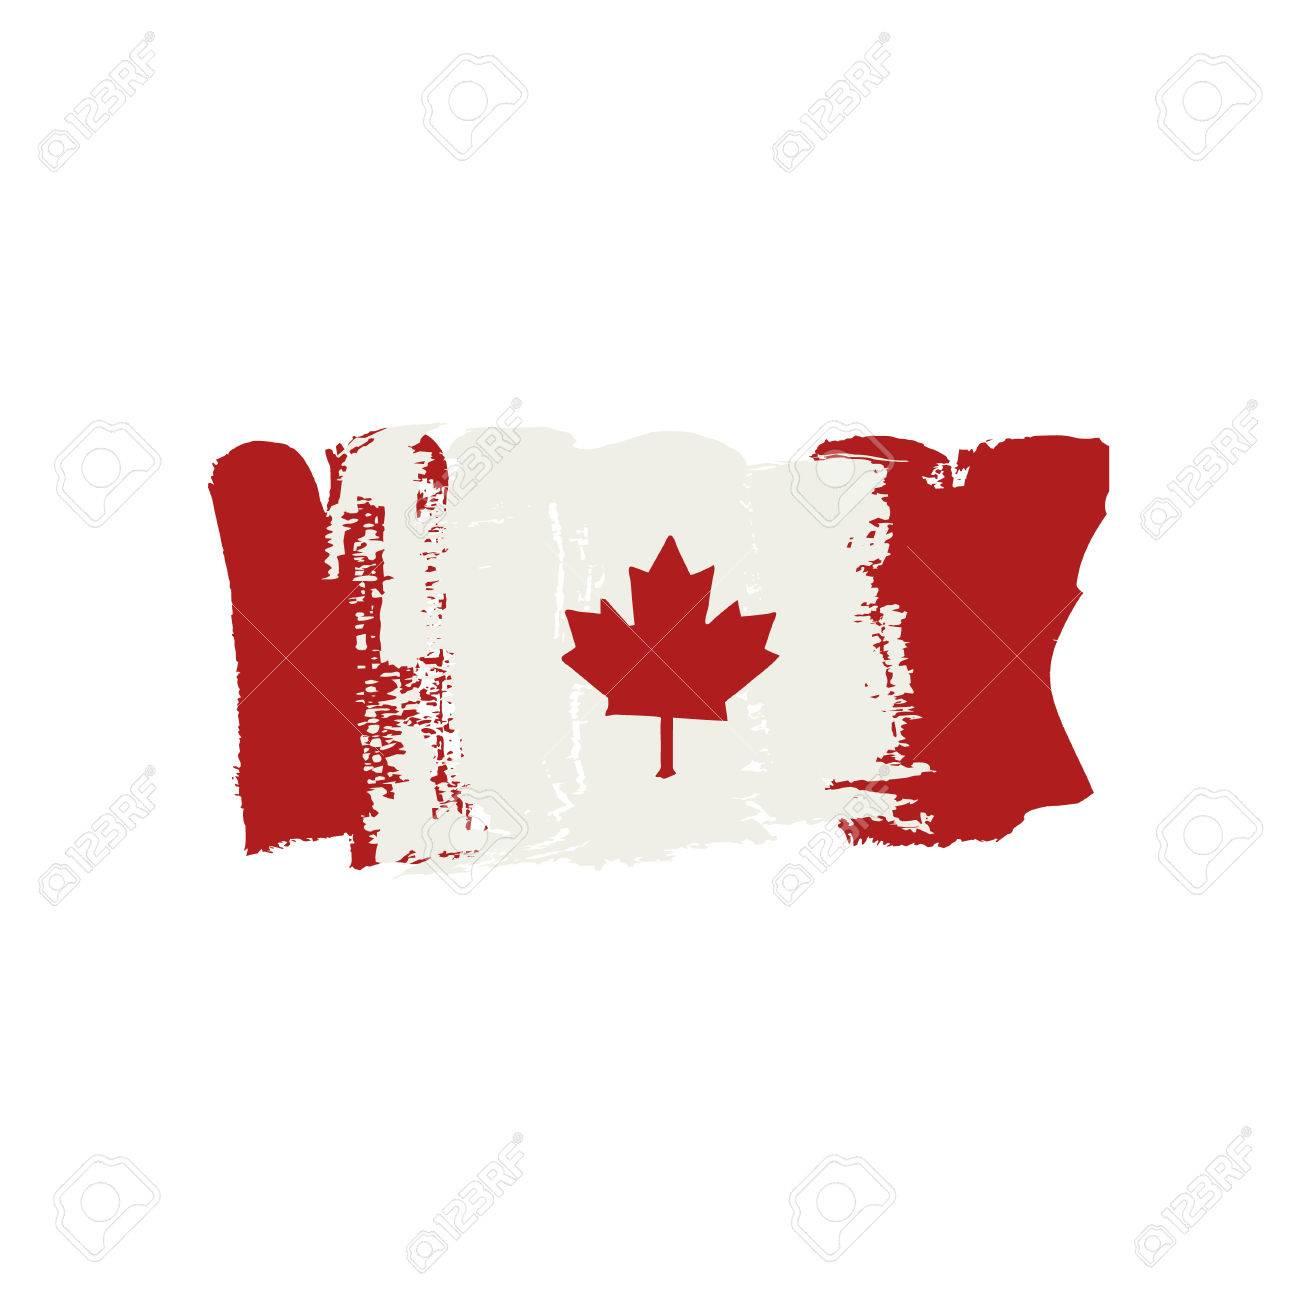 Indicador De Canadá Pintado Por Pinturas Cepillo De Mano. Bandera ...